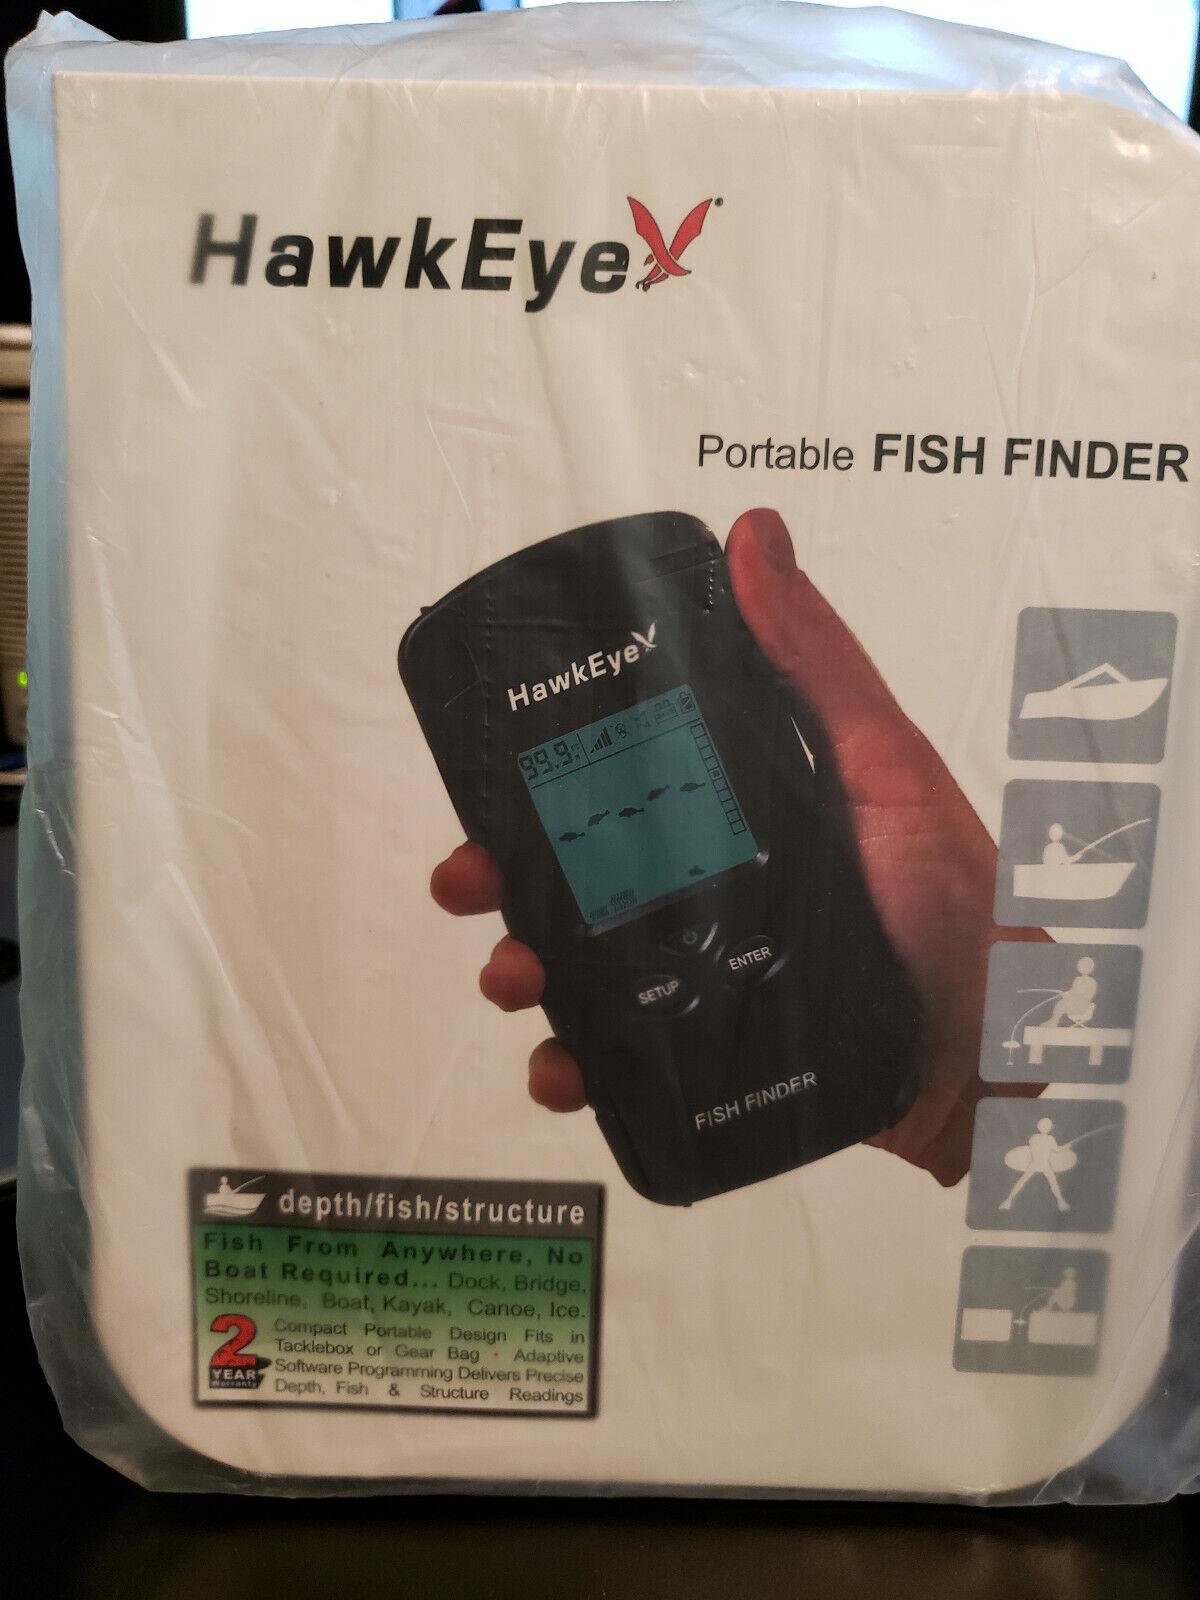 Norcross Hawkeye F33p Fish Finder Manual